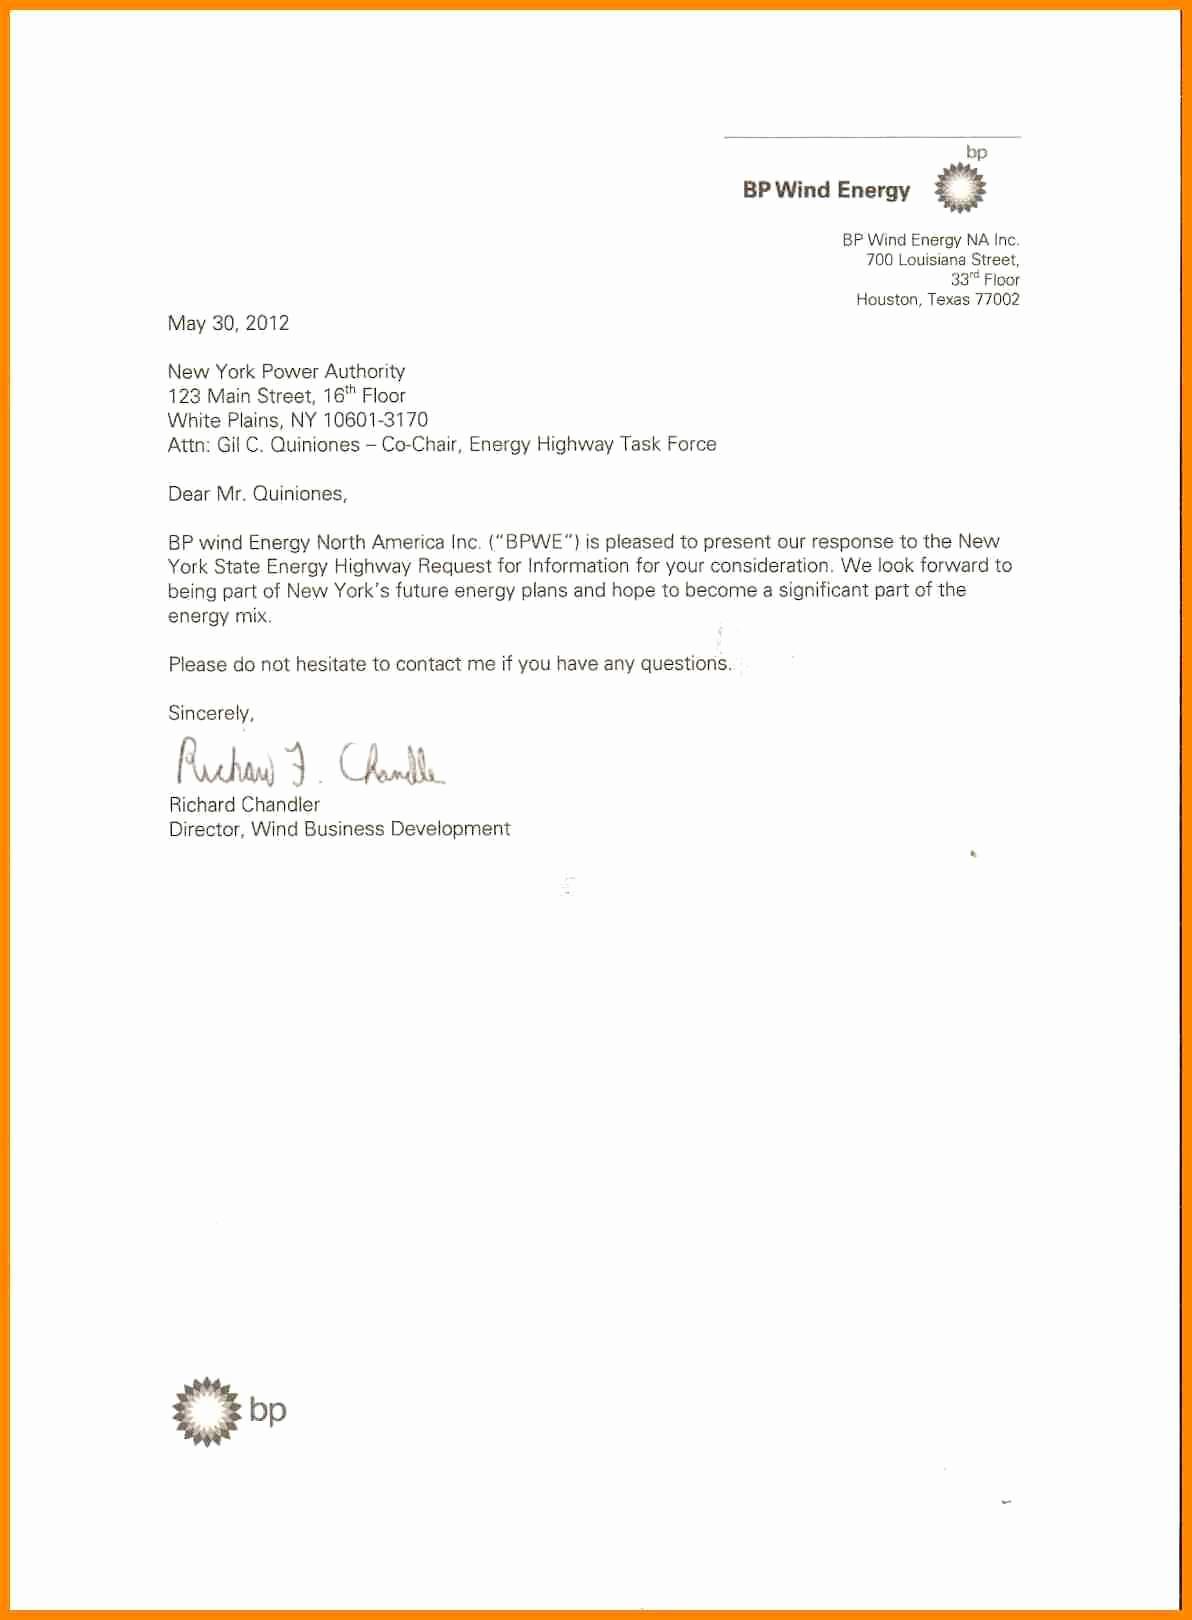 Business Development Cover Letter Template - Resume Cover Letters Samples Unique Good Cover Letter Samples New